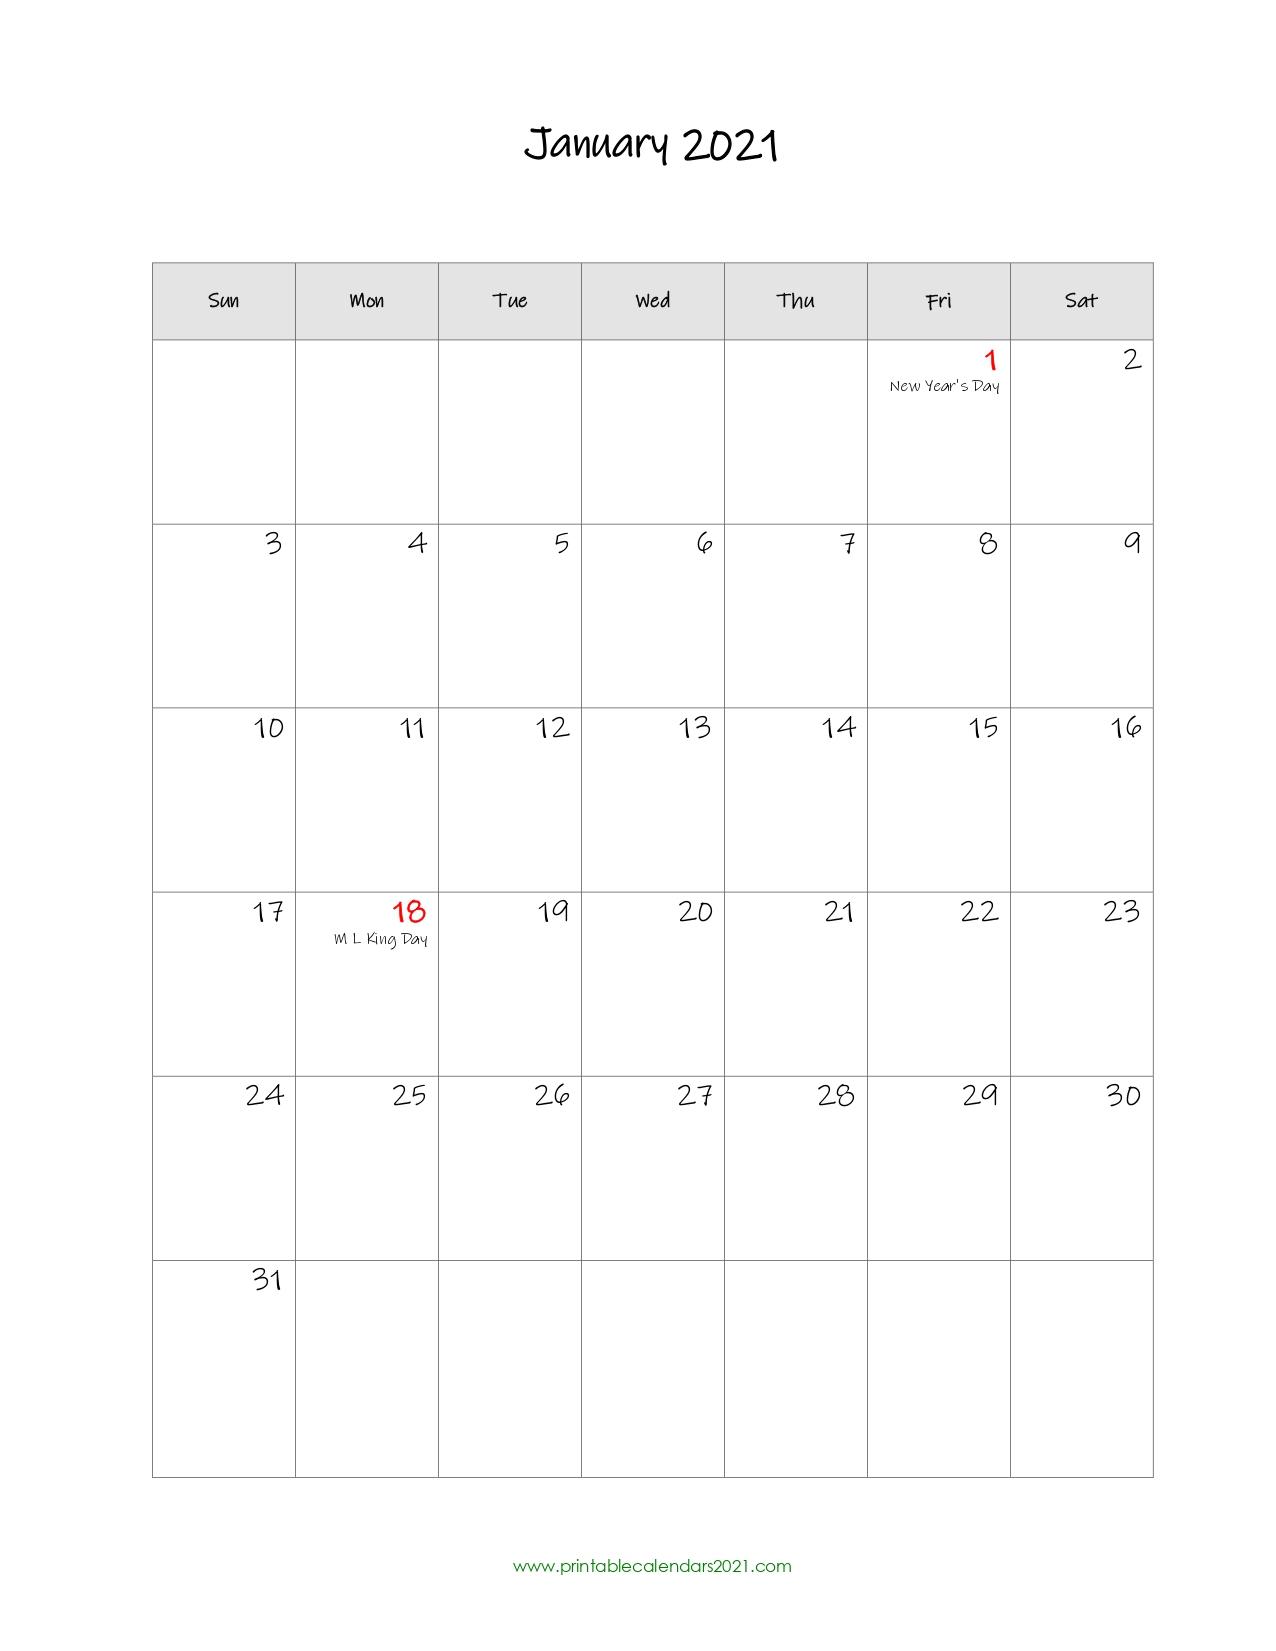 65 Printable Calendar January 2021 Holidays Portrait 1